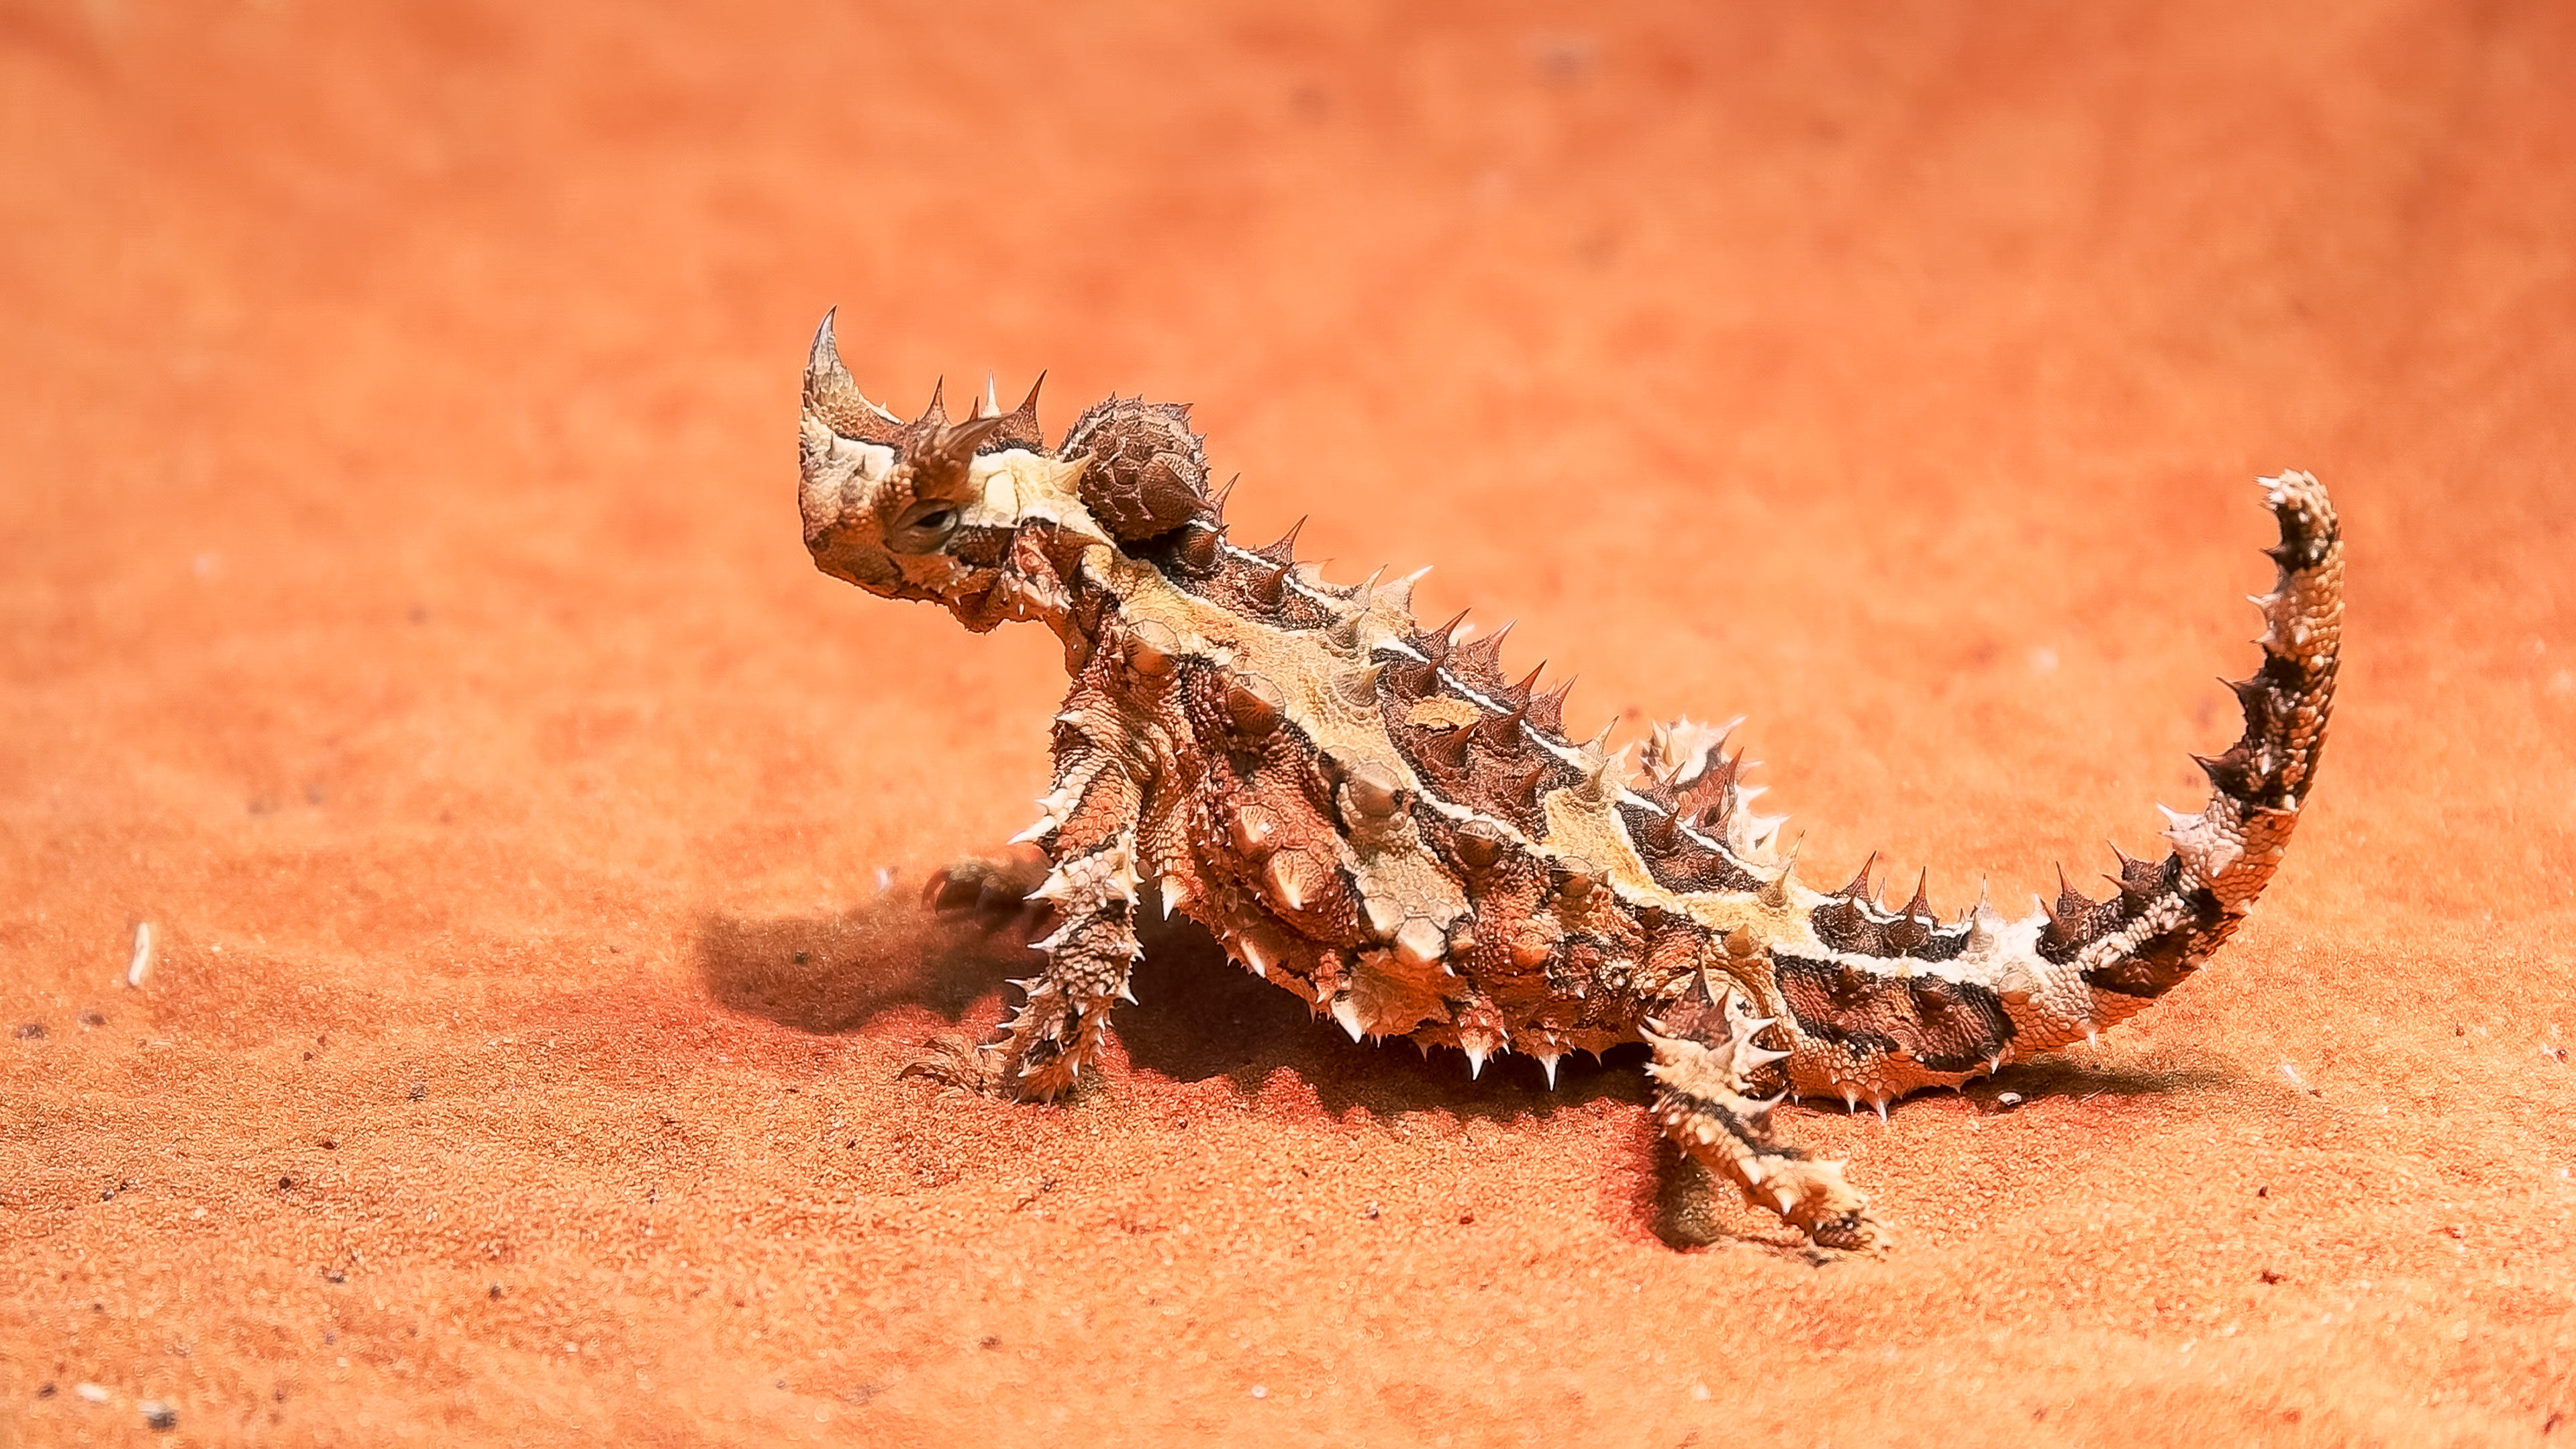 Australian thorny devil lizard turns its head and looks around